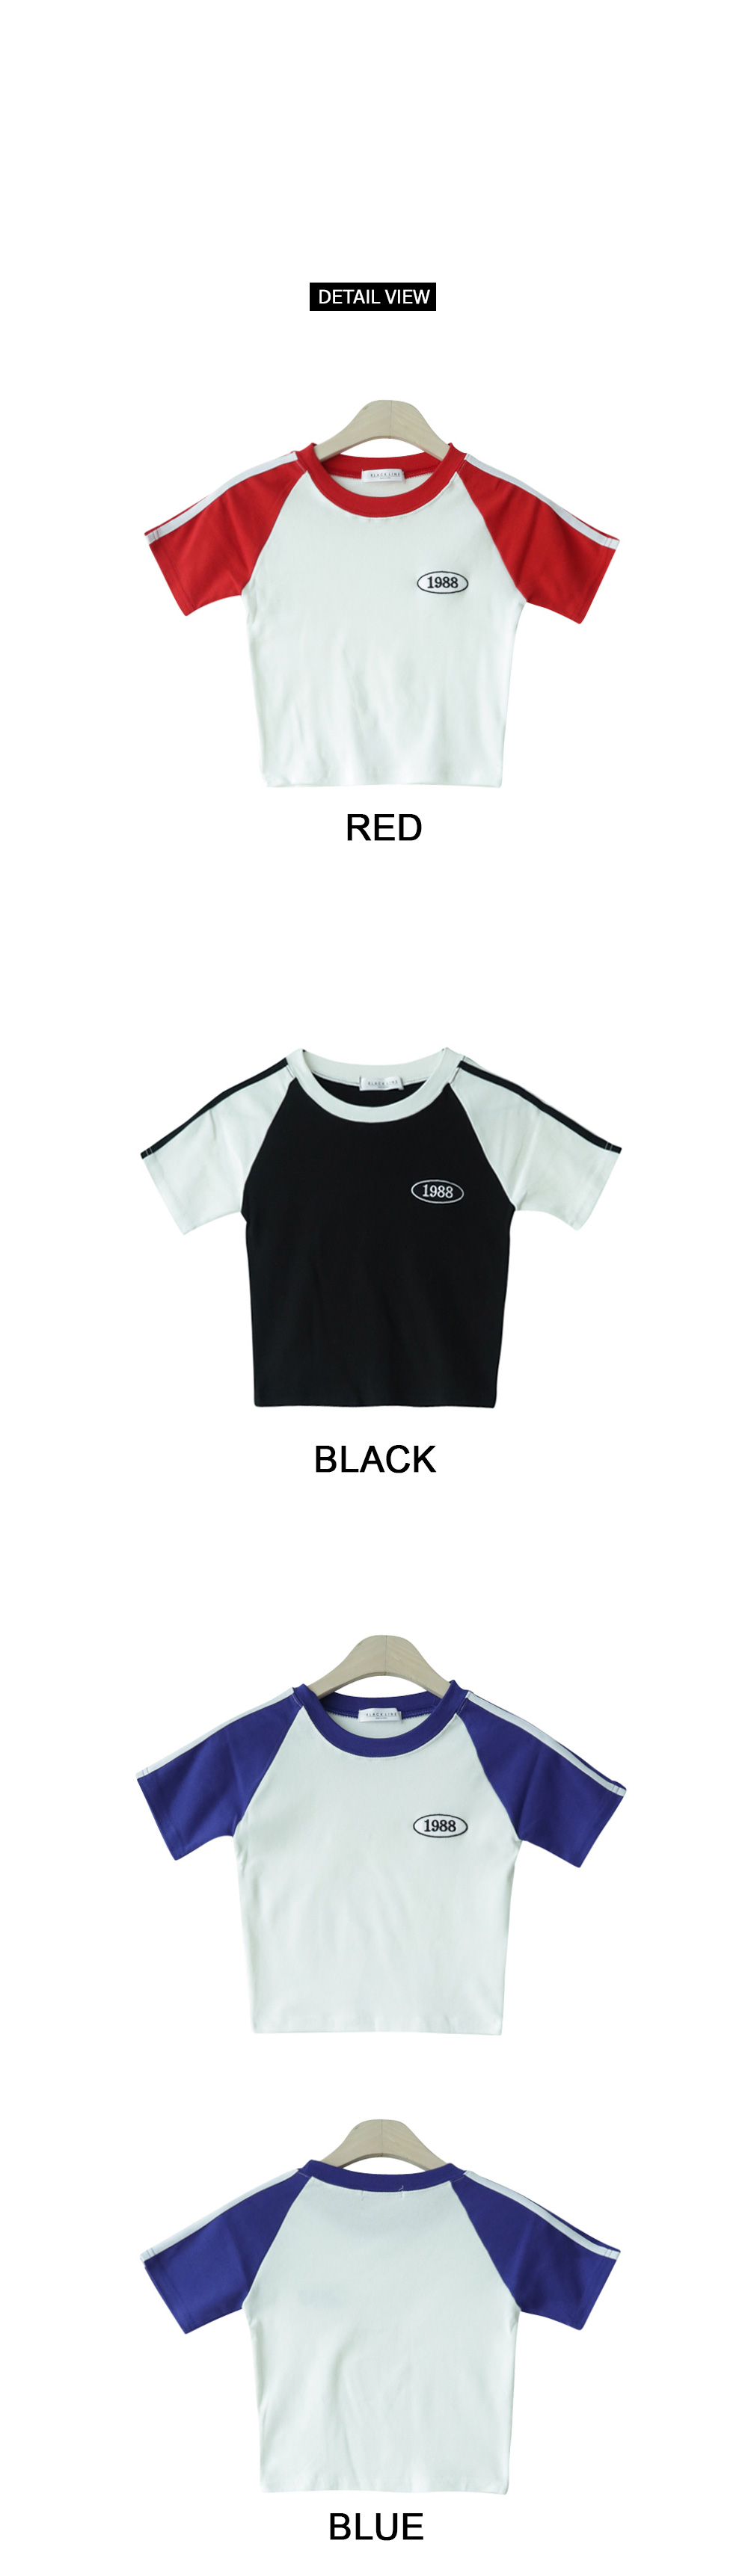 1988 cropped shirt